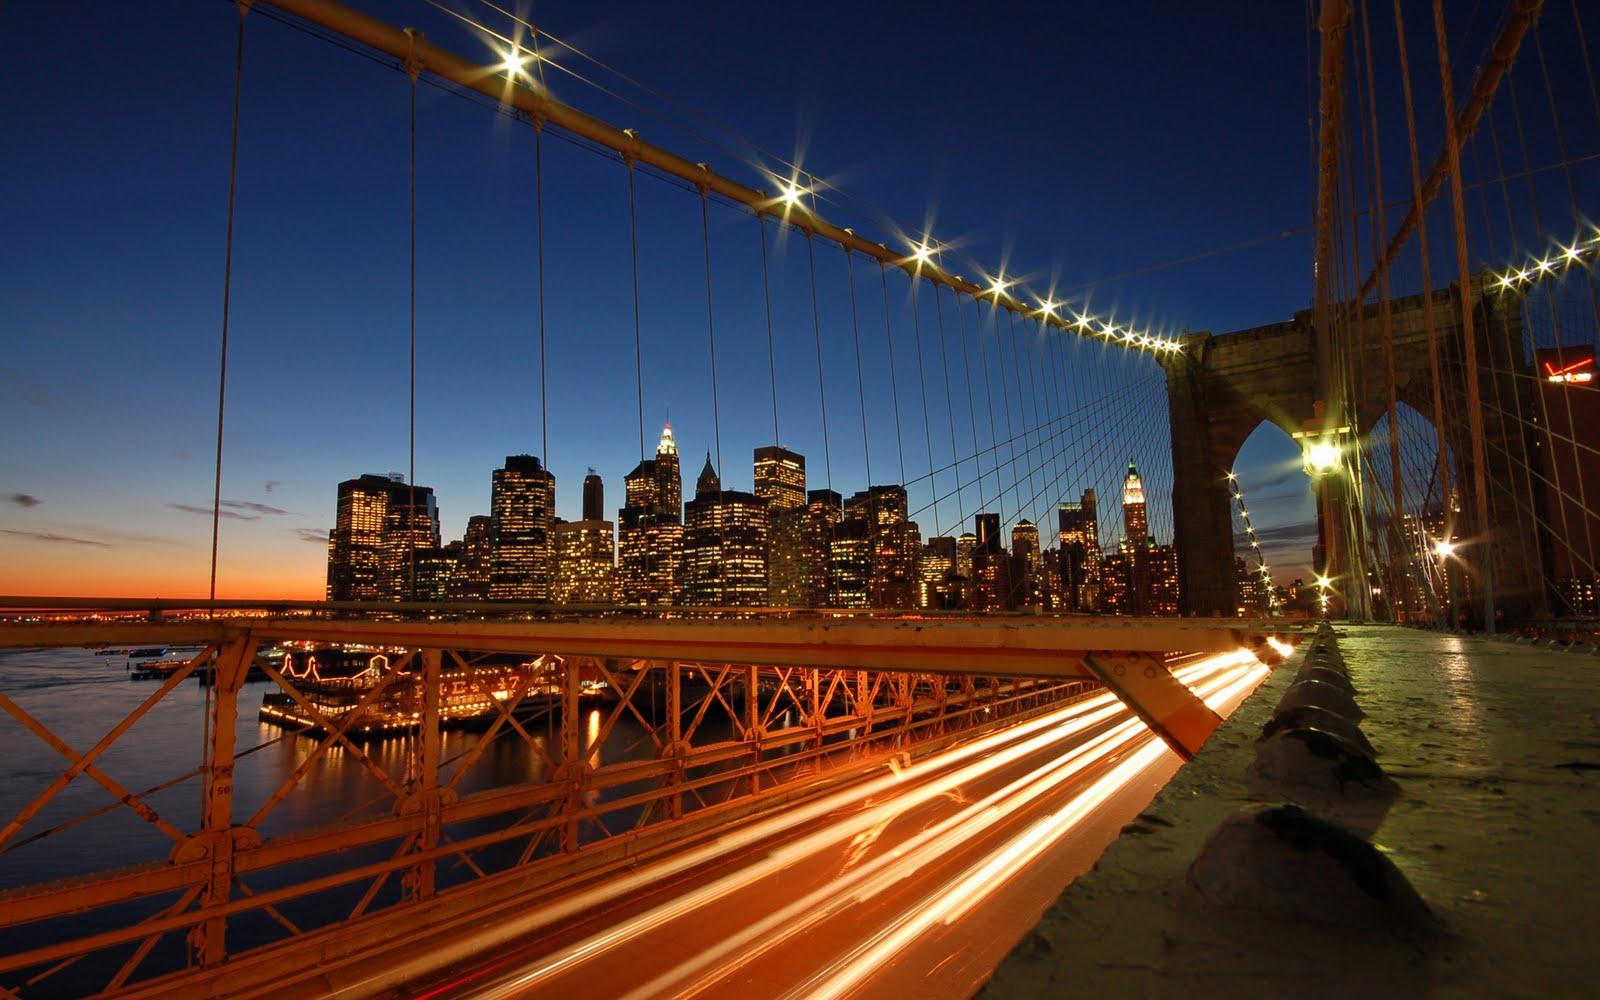 light bridge wallpaper - photo #27